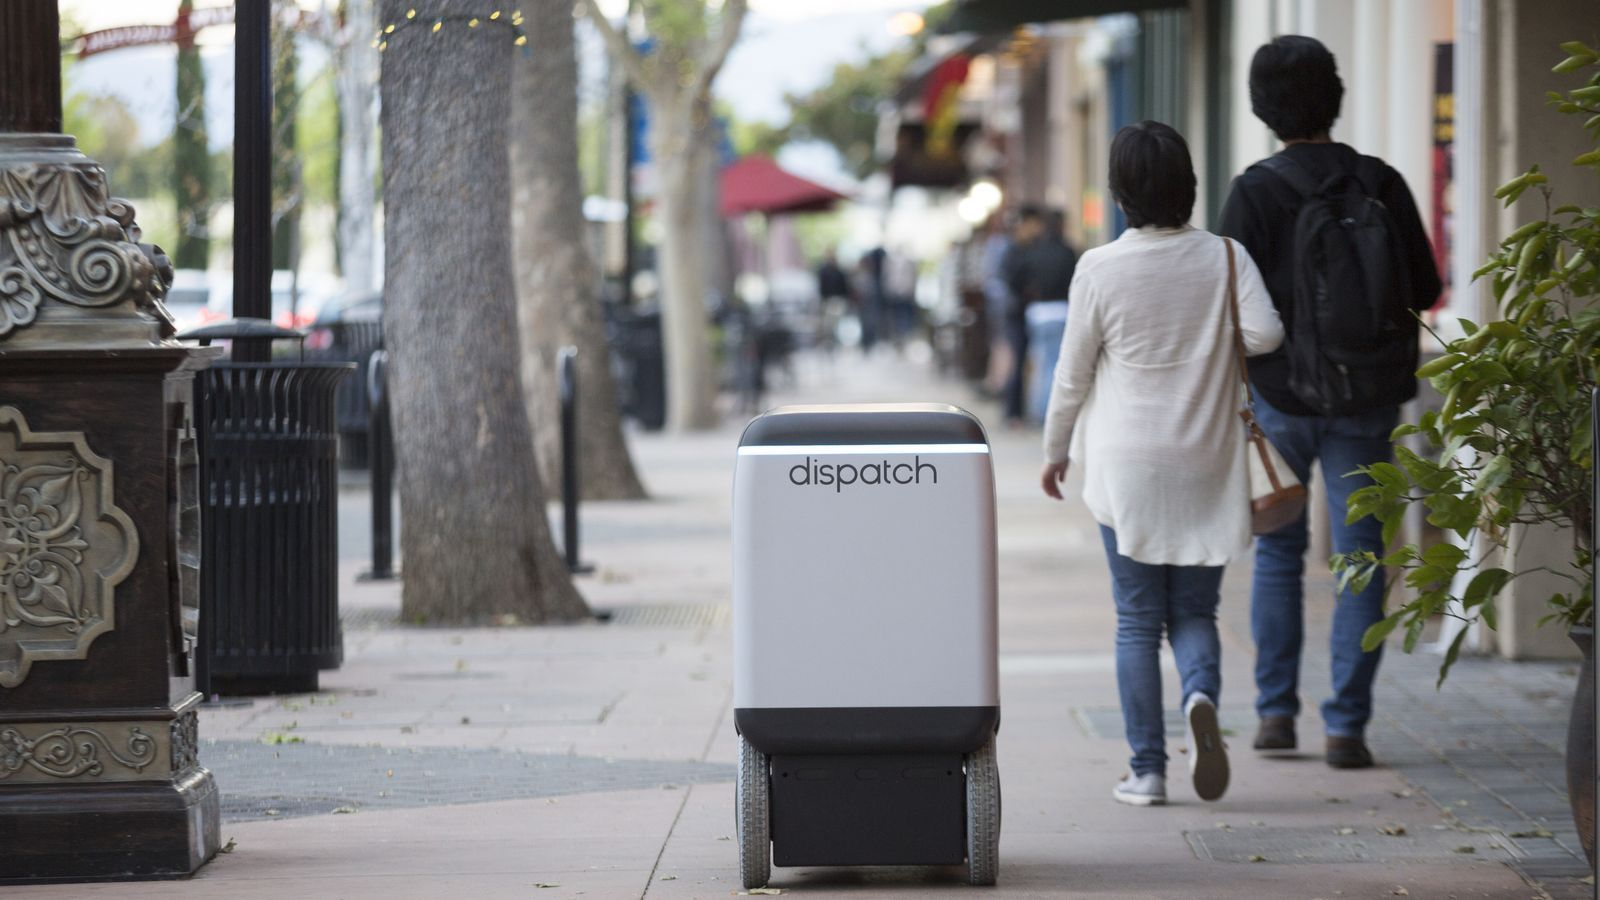 Arriba el robot repartidor que circula per la vorera